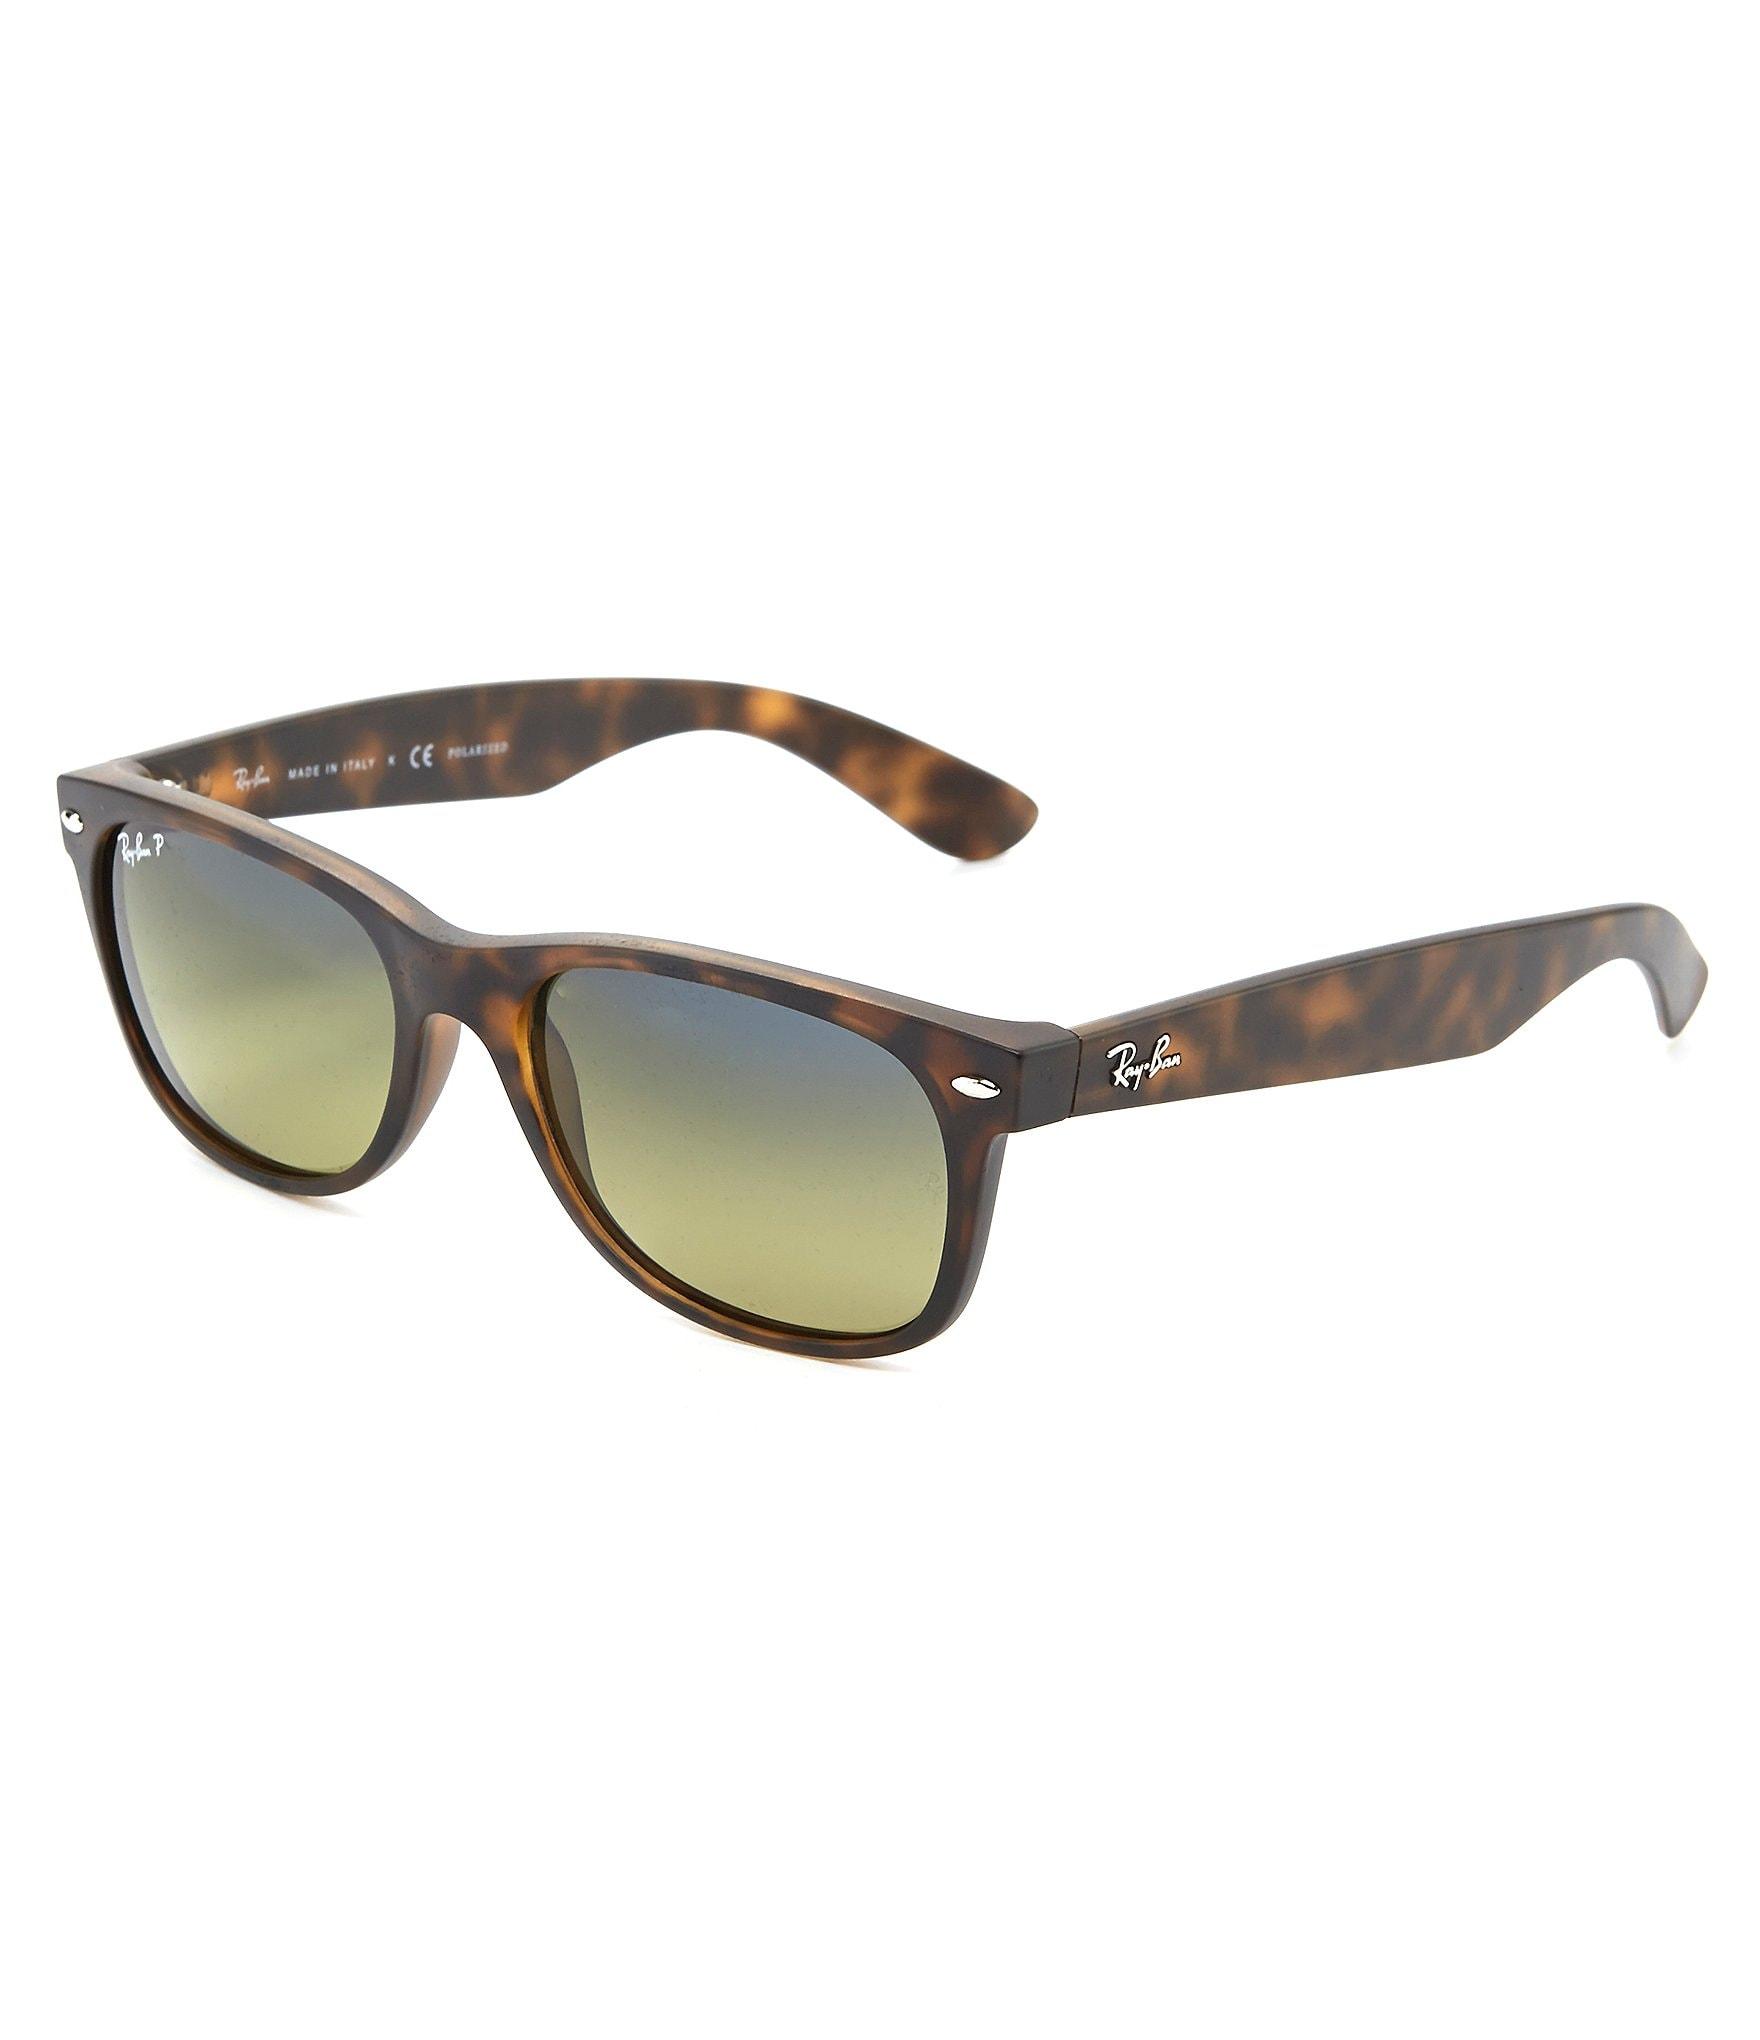 4fc7b55200a Ray-Ban Women s Sunglasses   Eyewear